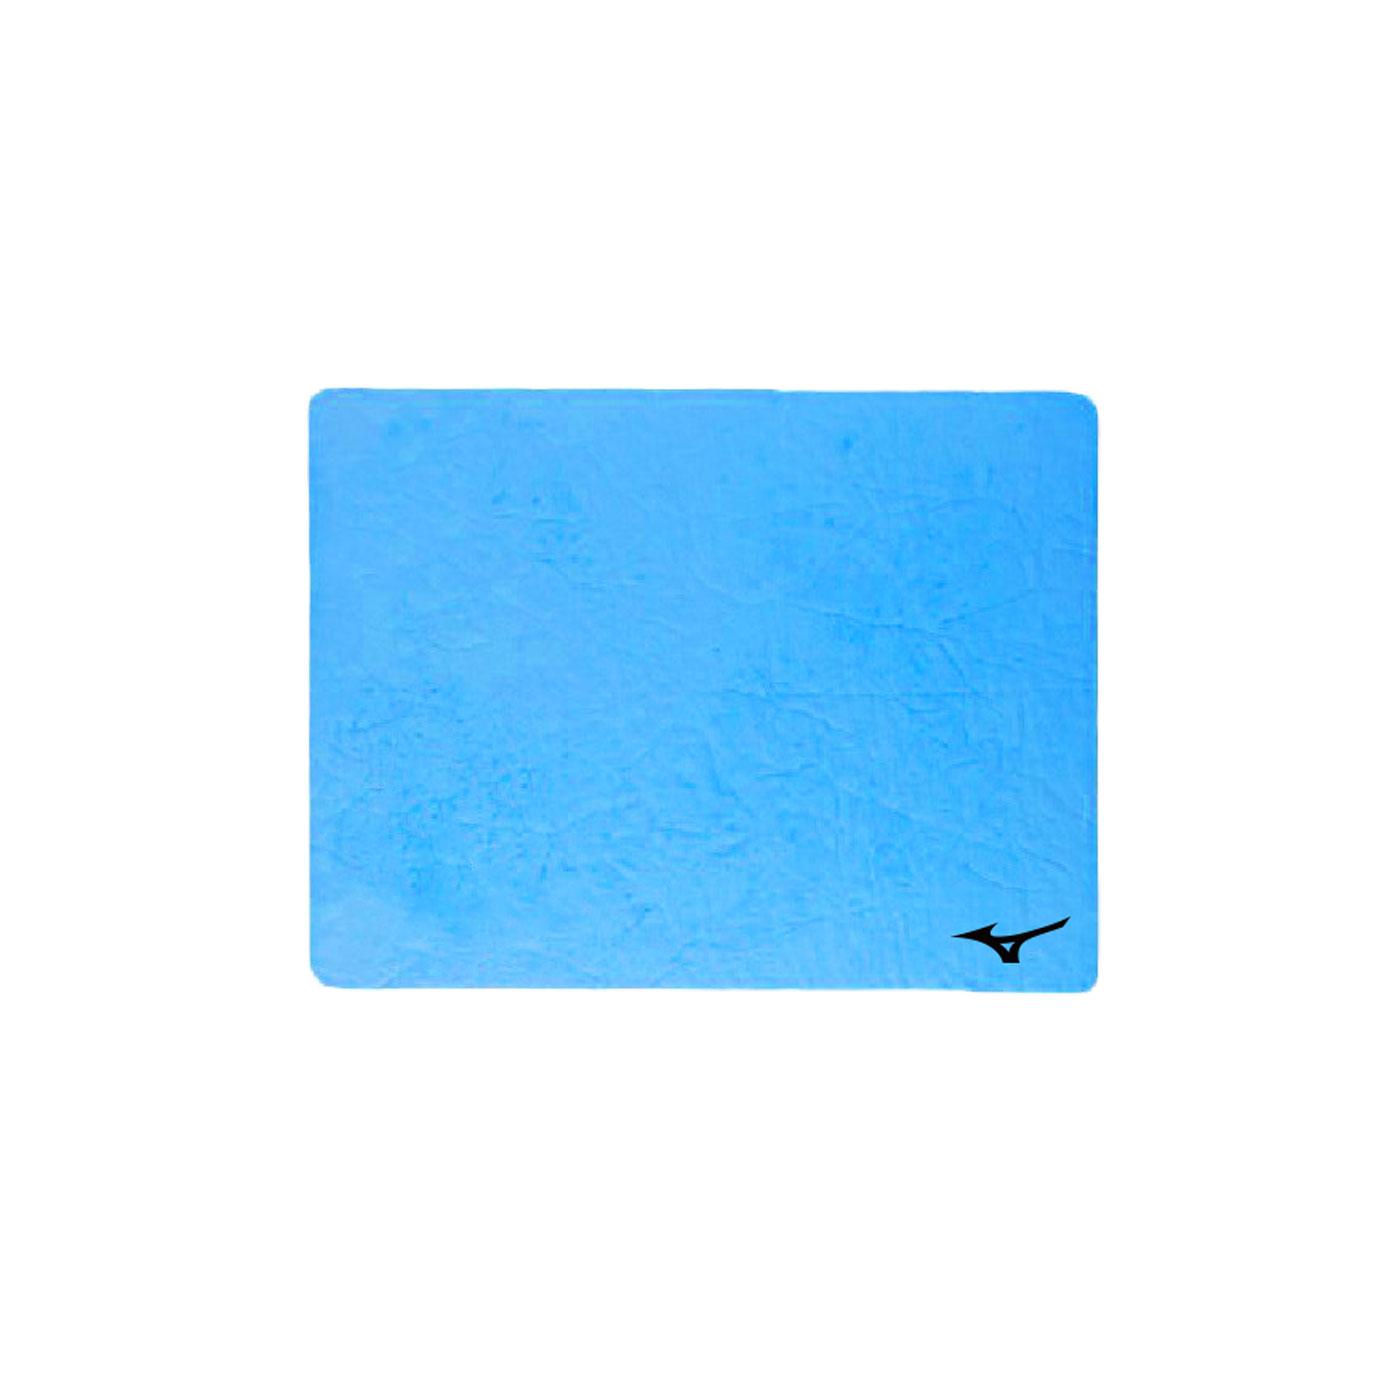 MIZUNO 日製吸水巾  SWIMN2JY801000-19 - 寶藍